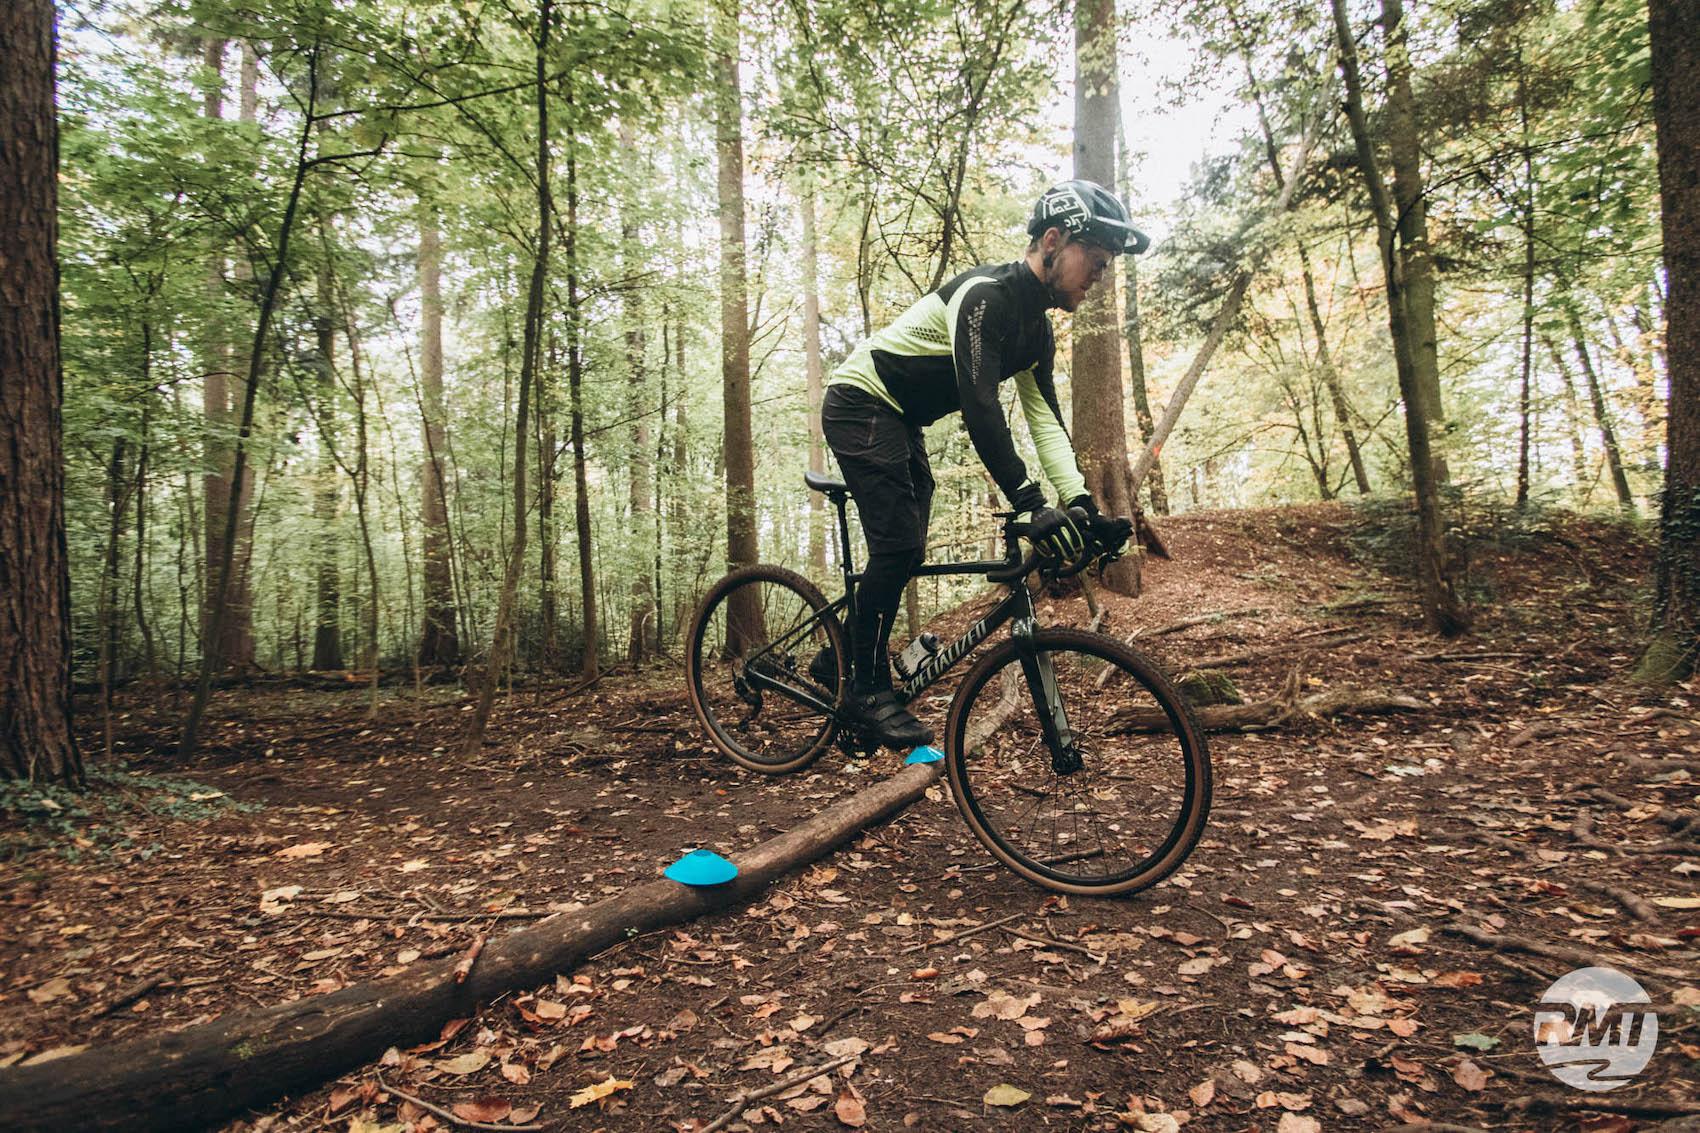 Gravel Fahrtechnik Basic Nürnberg Trails CycloCross Training Rock my Trail Bikeschule